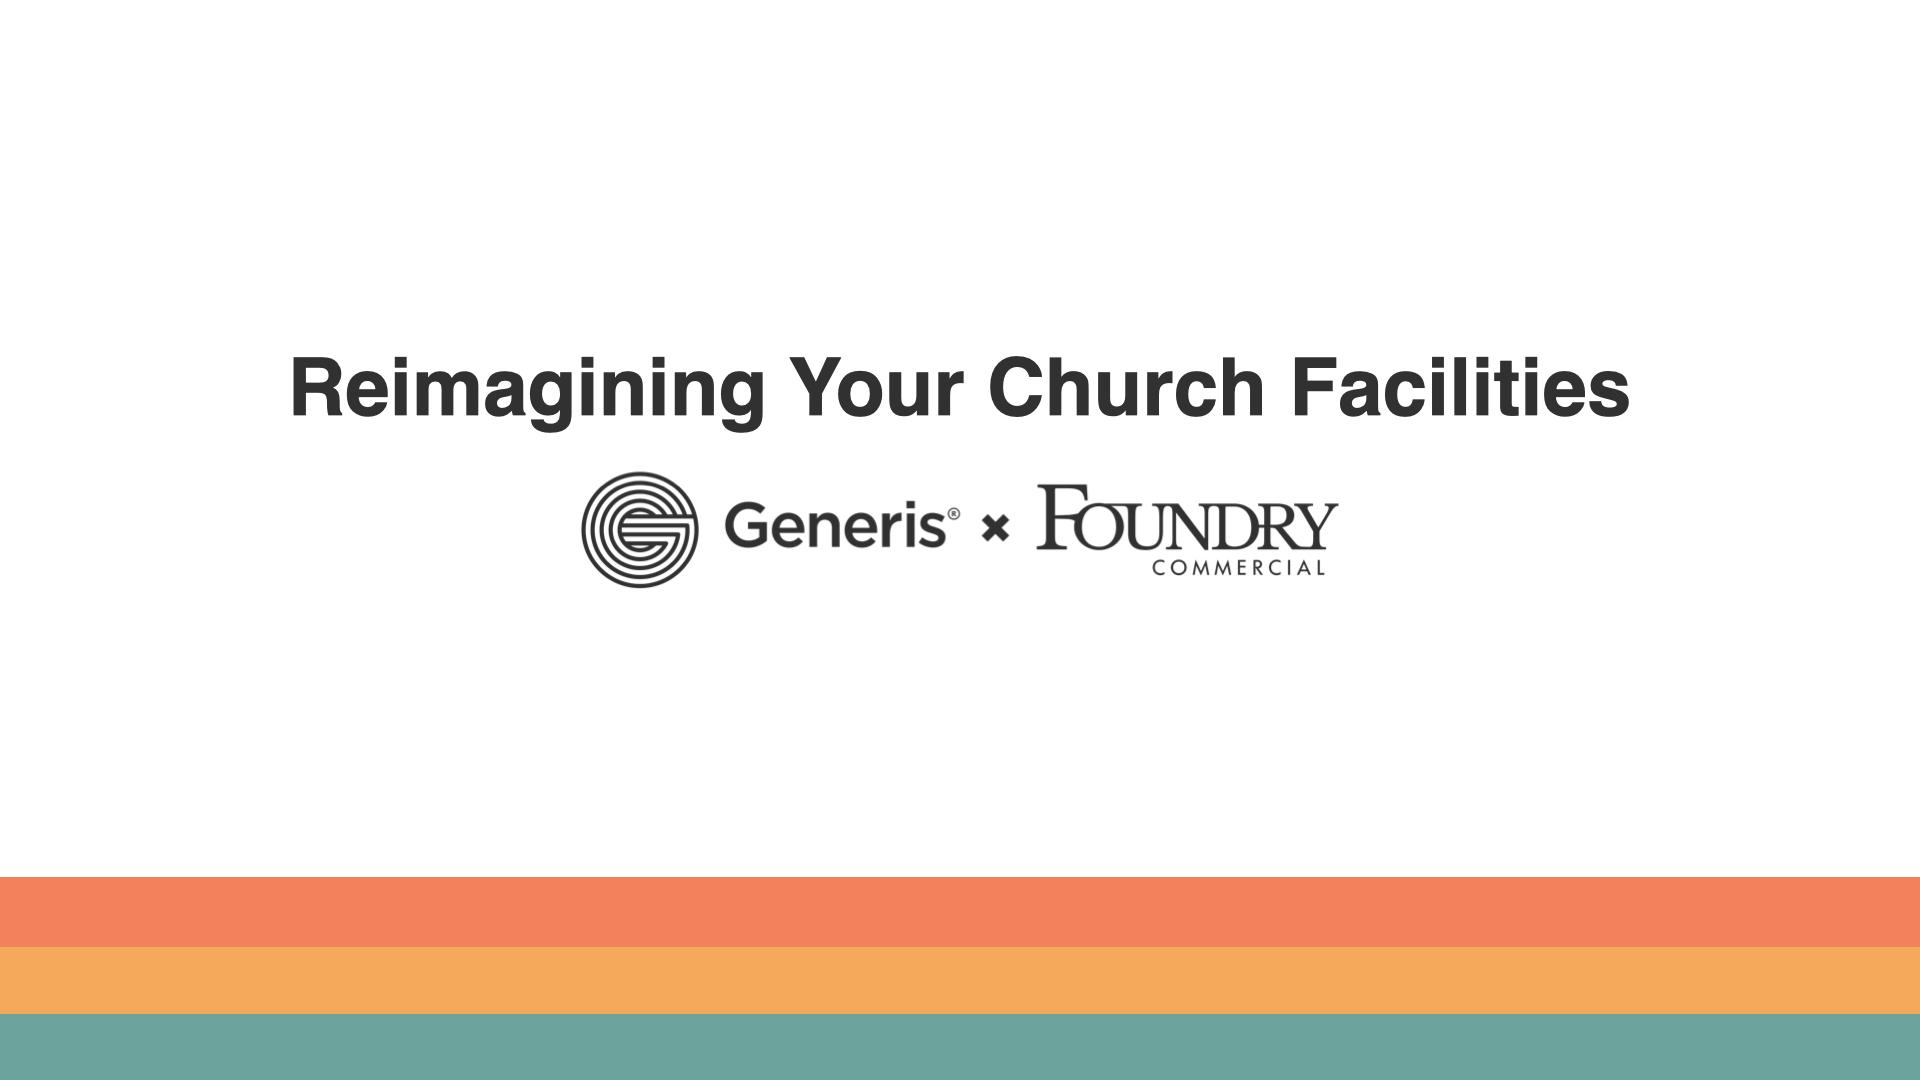 Reimagining Your Church Facilities